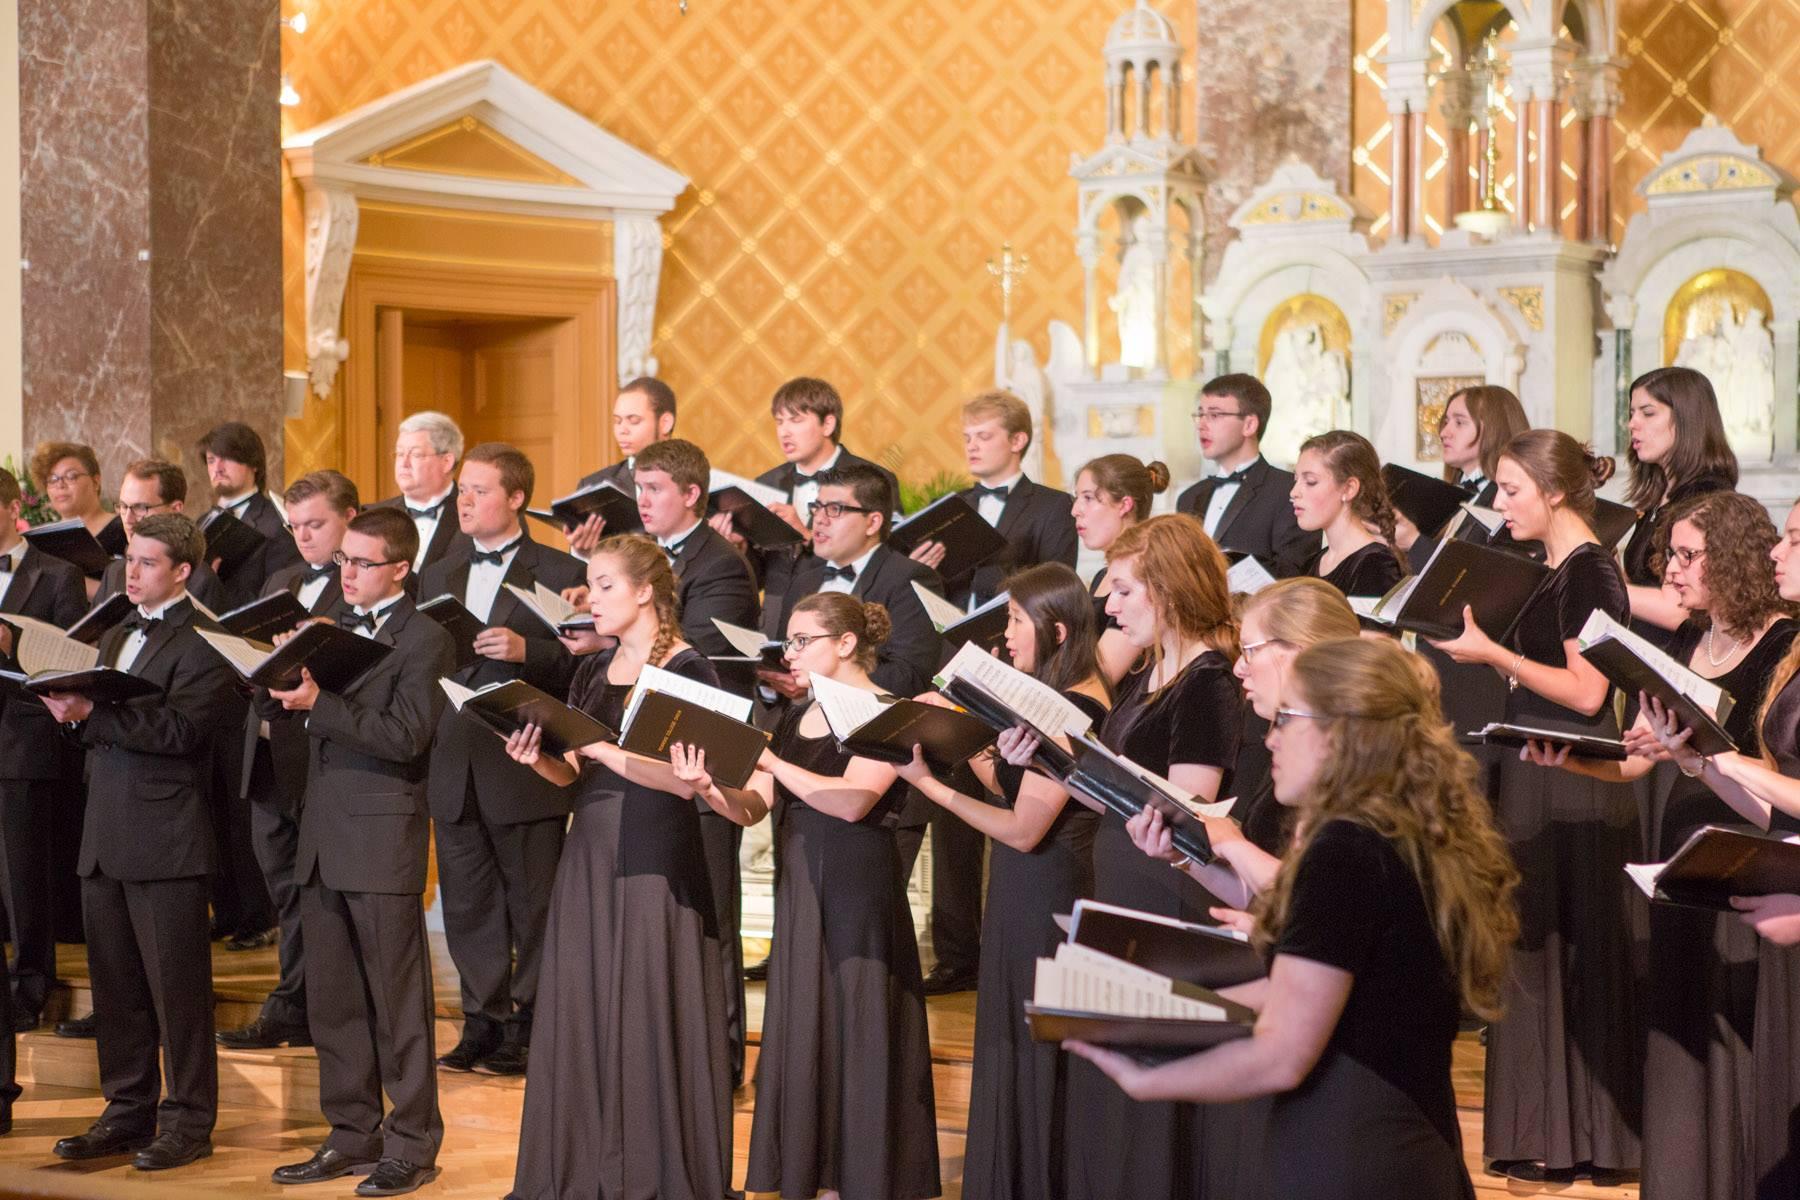 The Closing Organ Concert